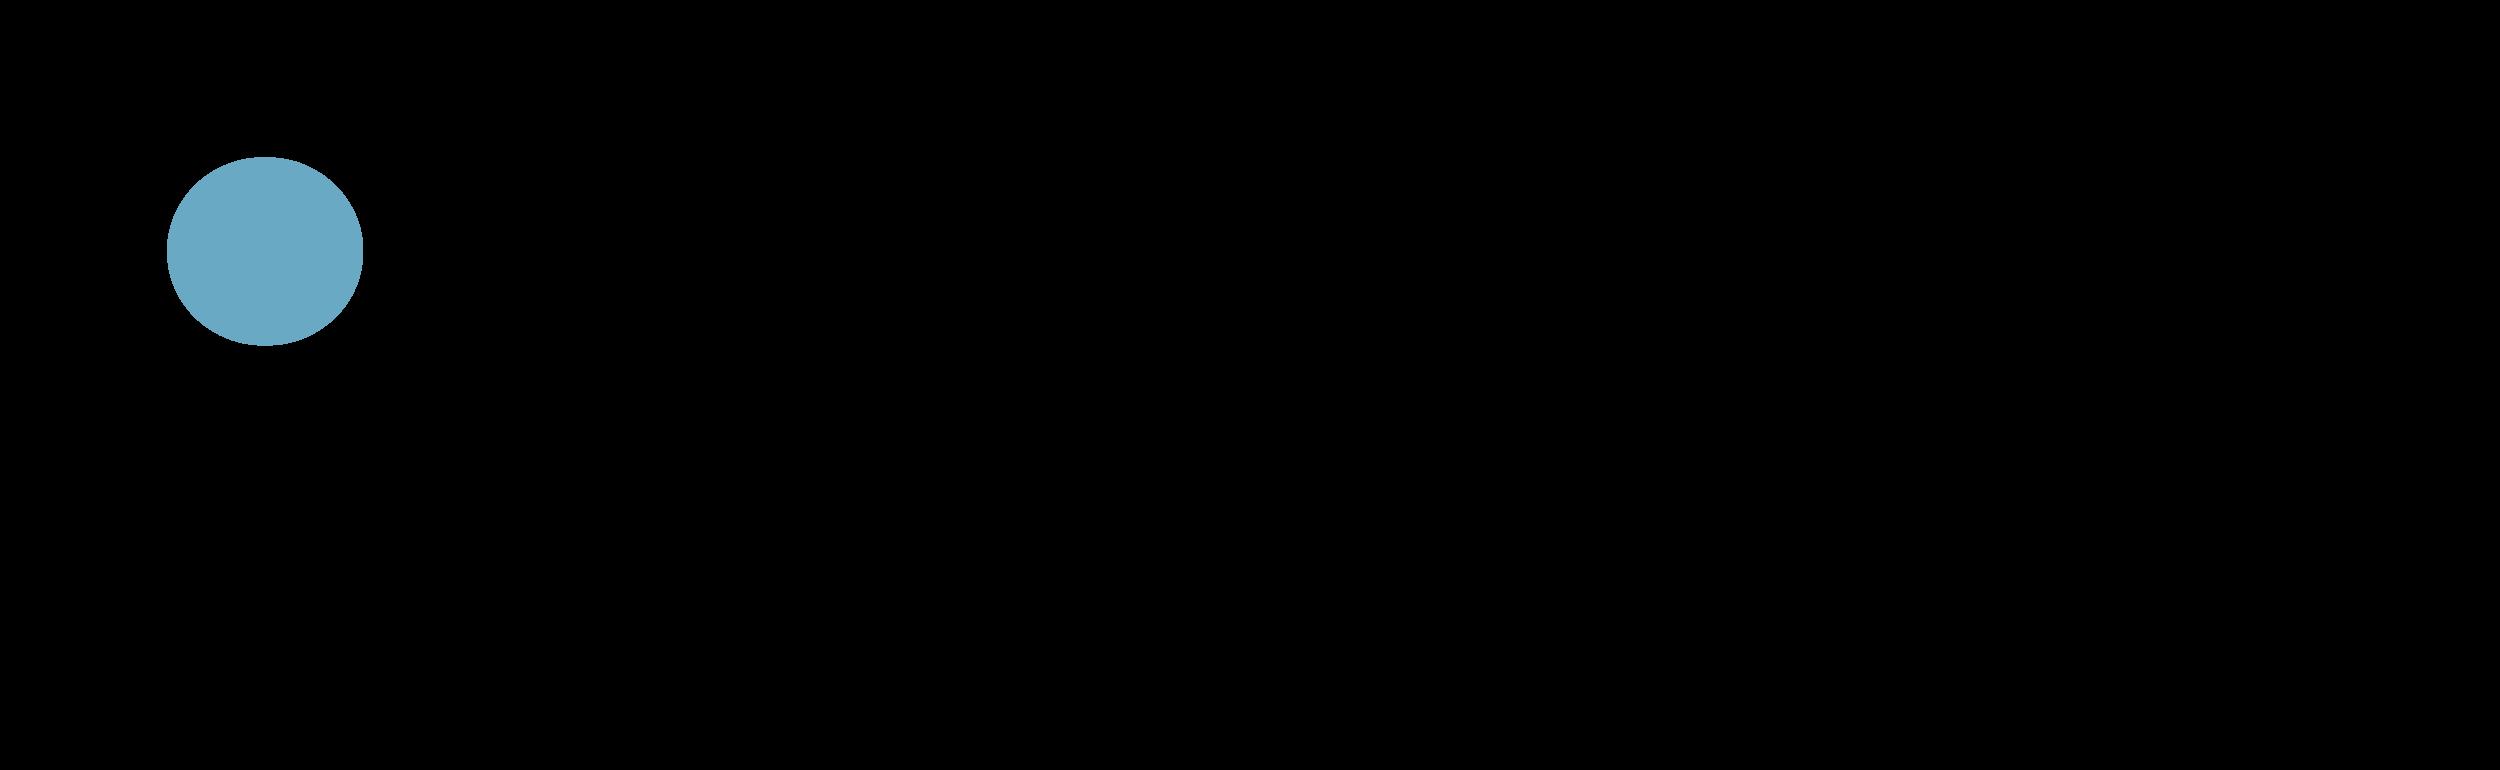 ikentoo-logo_0.png